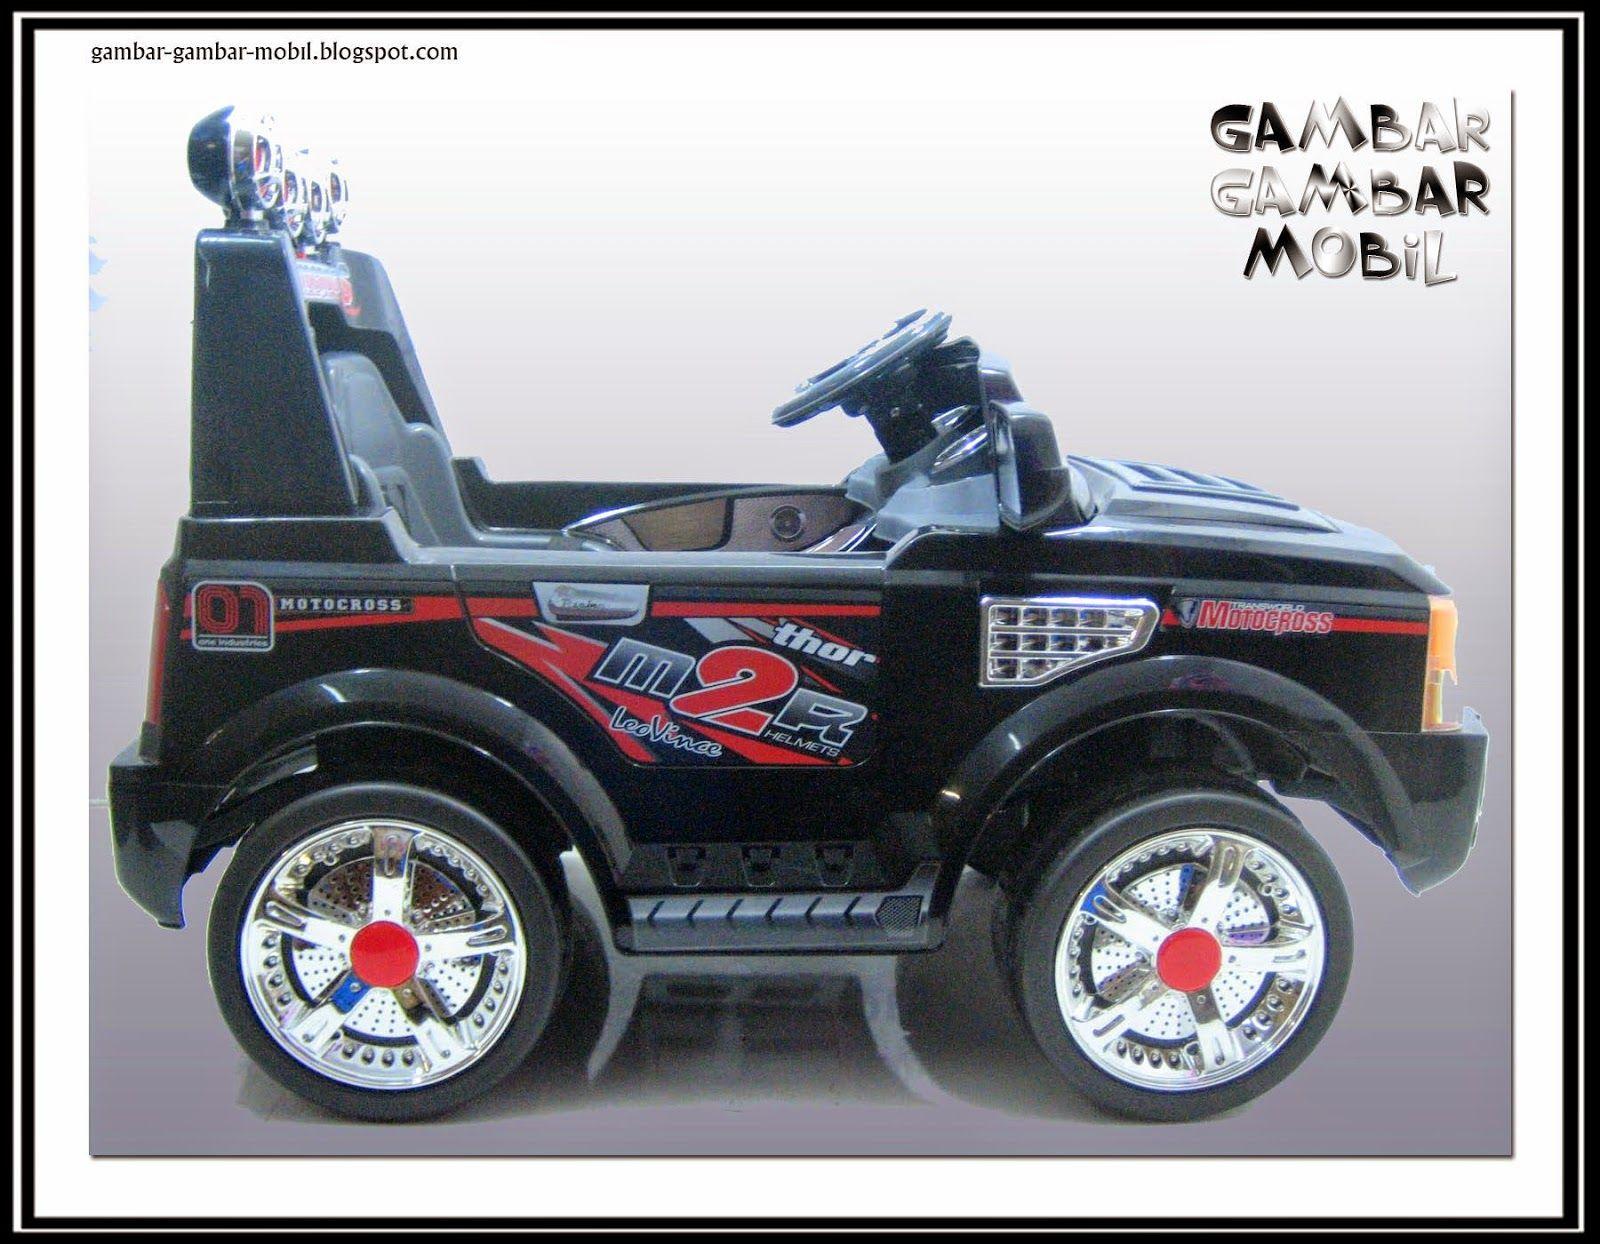 Gambar Mobil Mainan Gambar Gambar Mobil Mobil Mainan Mobil Mainan